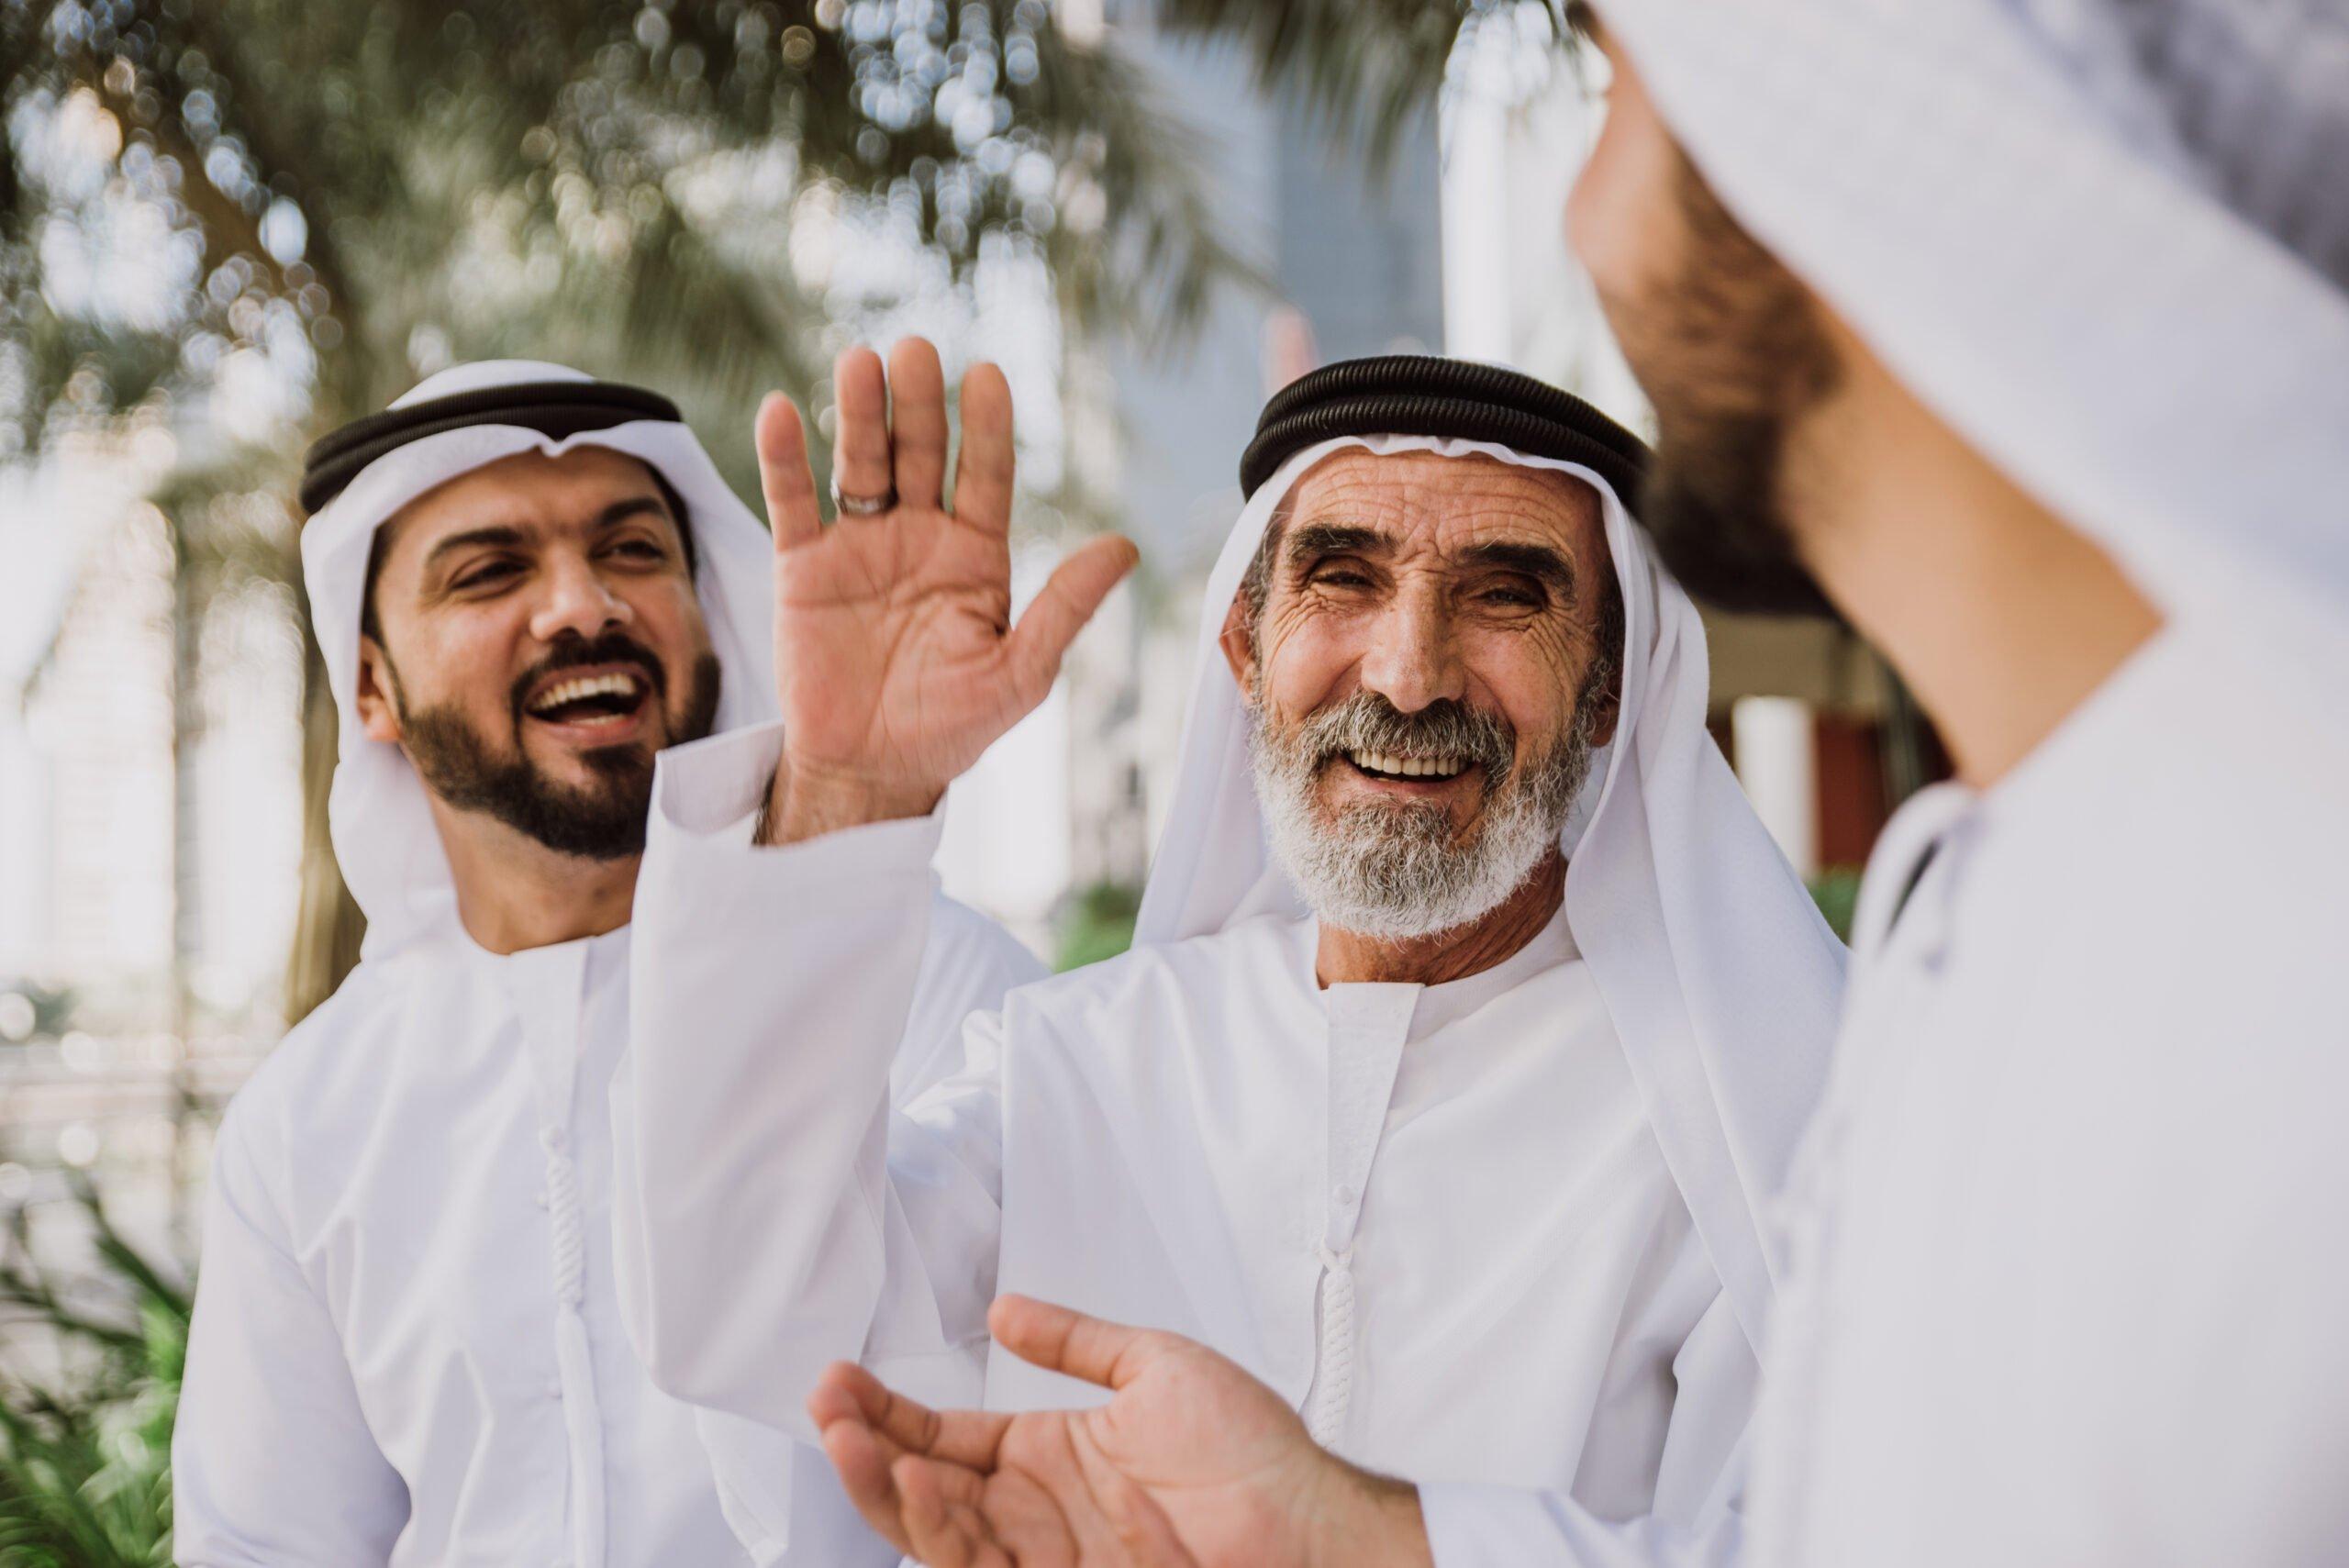 How to meet locals in UAE